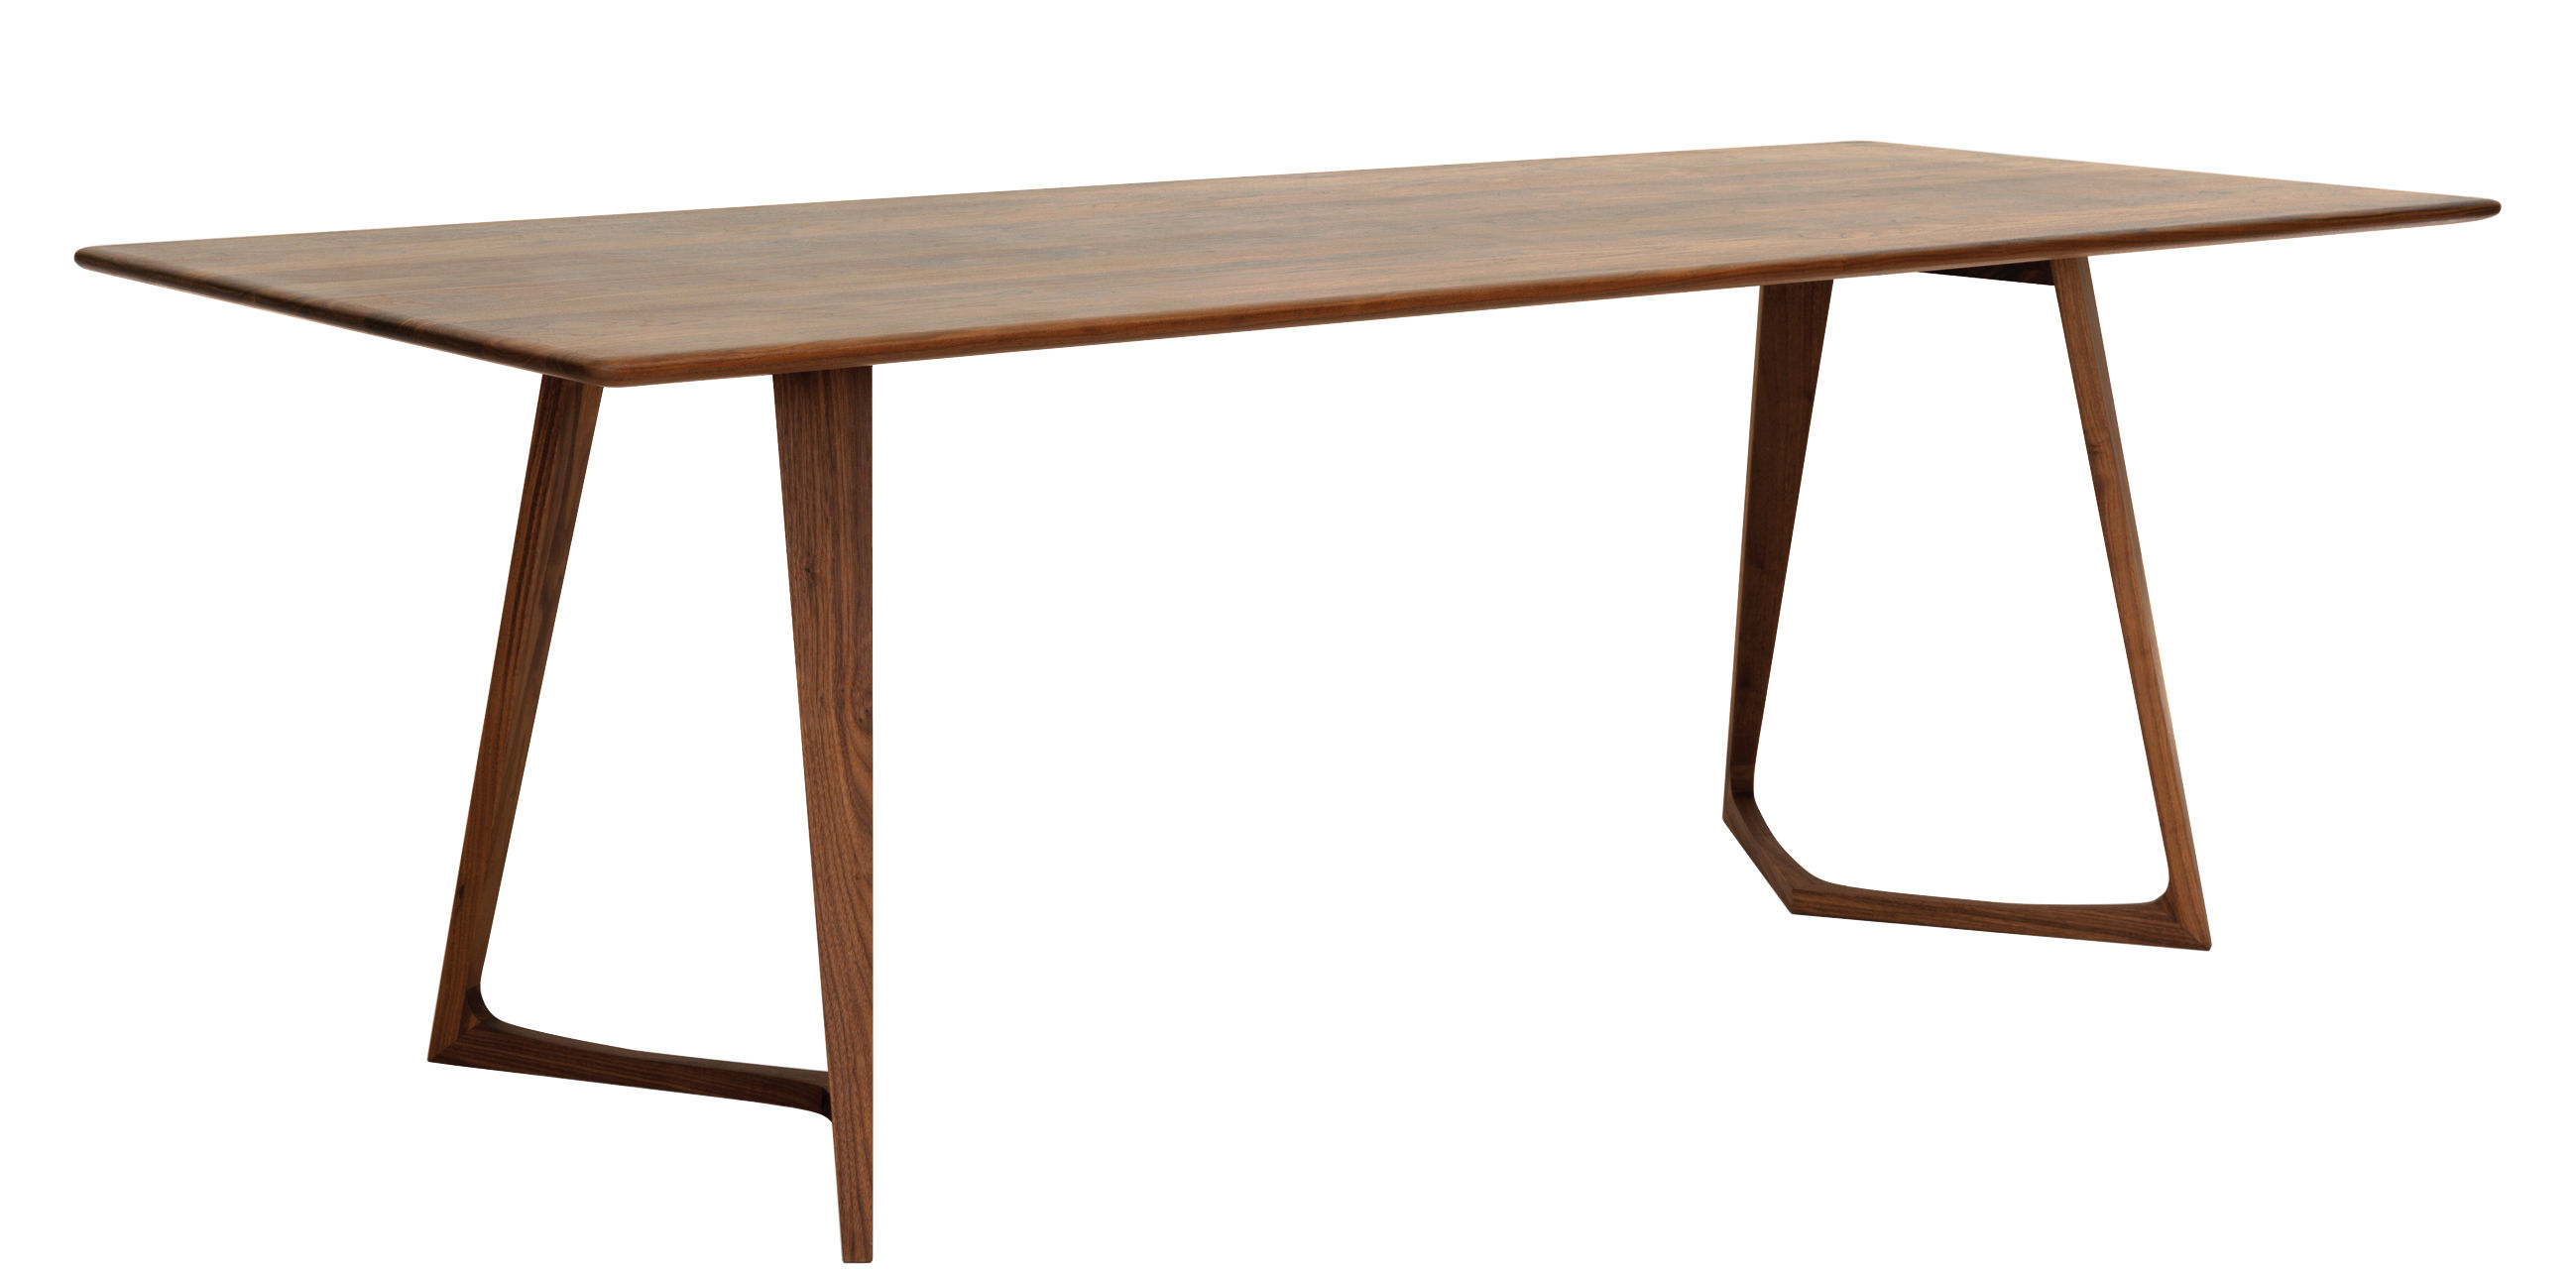 Mobilier - Tables - Table rectangulaire Twist / 200 x 90 cm - Zeitraum - 200 x 90 cm - Noyer - Noyer massif